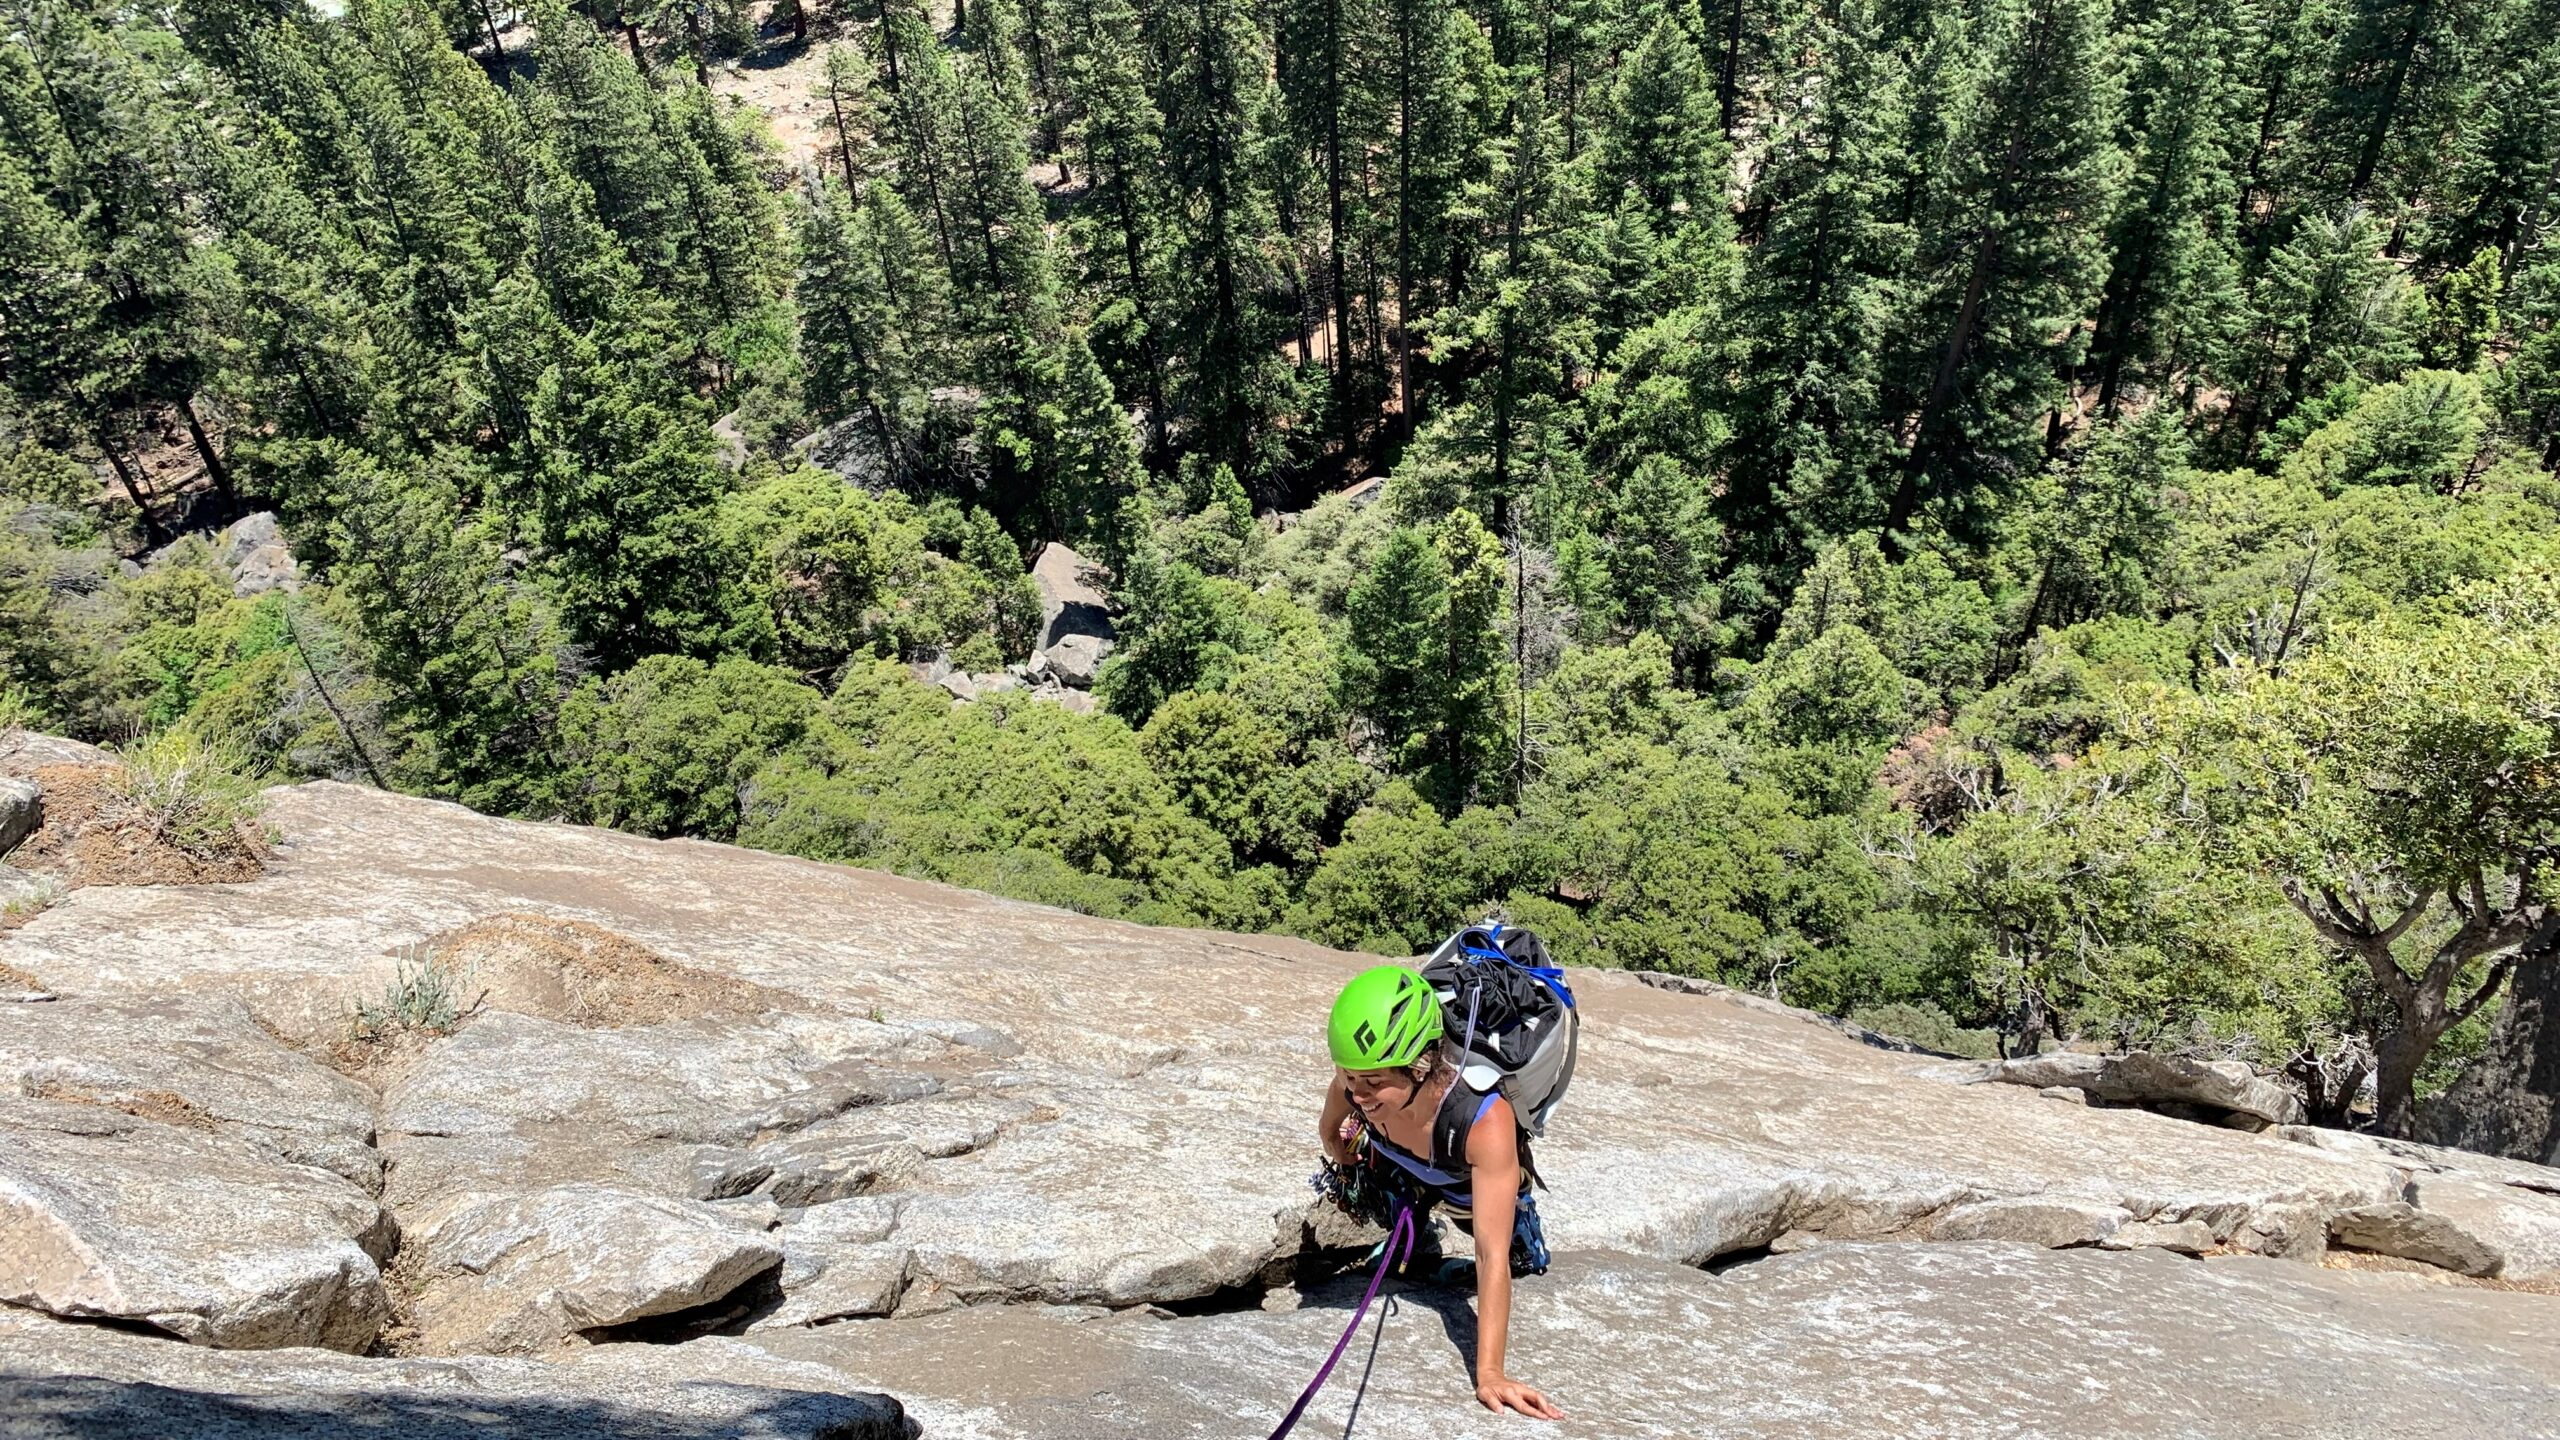 A lifetime opportunity!Yosemite National Park